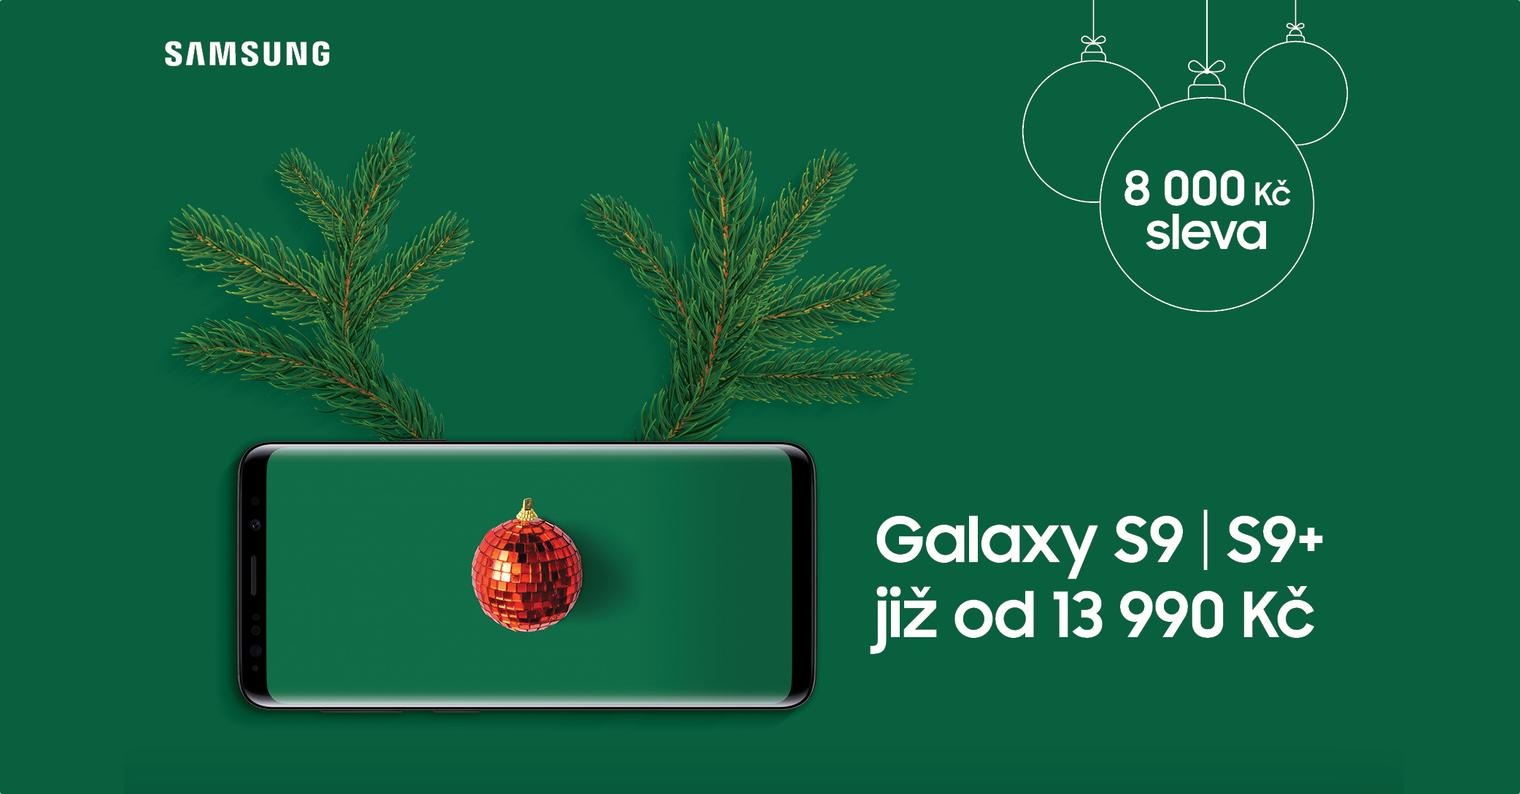 Samsung Galaxy S9 sleva